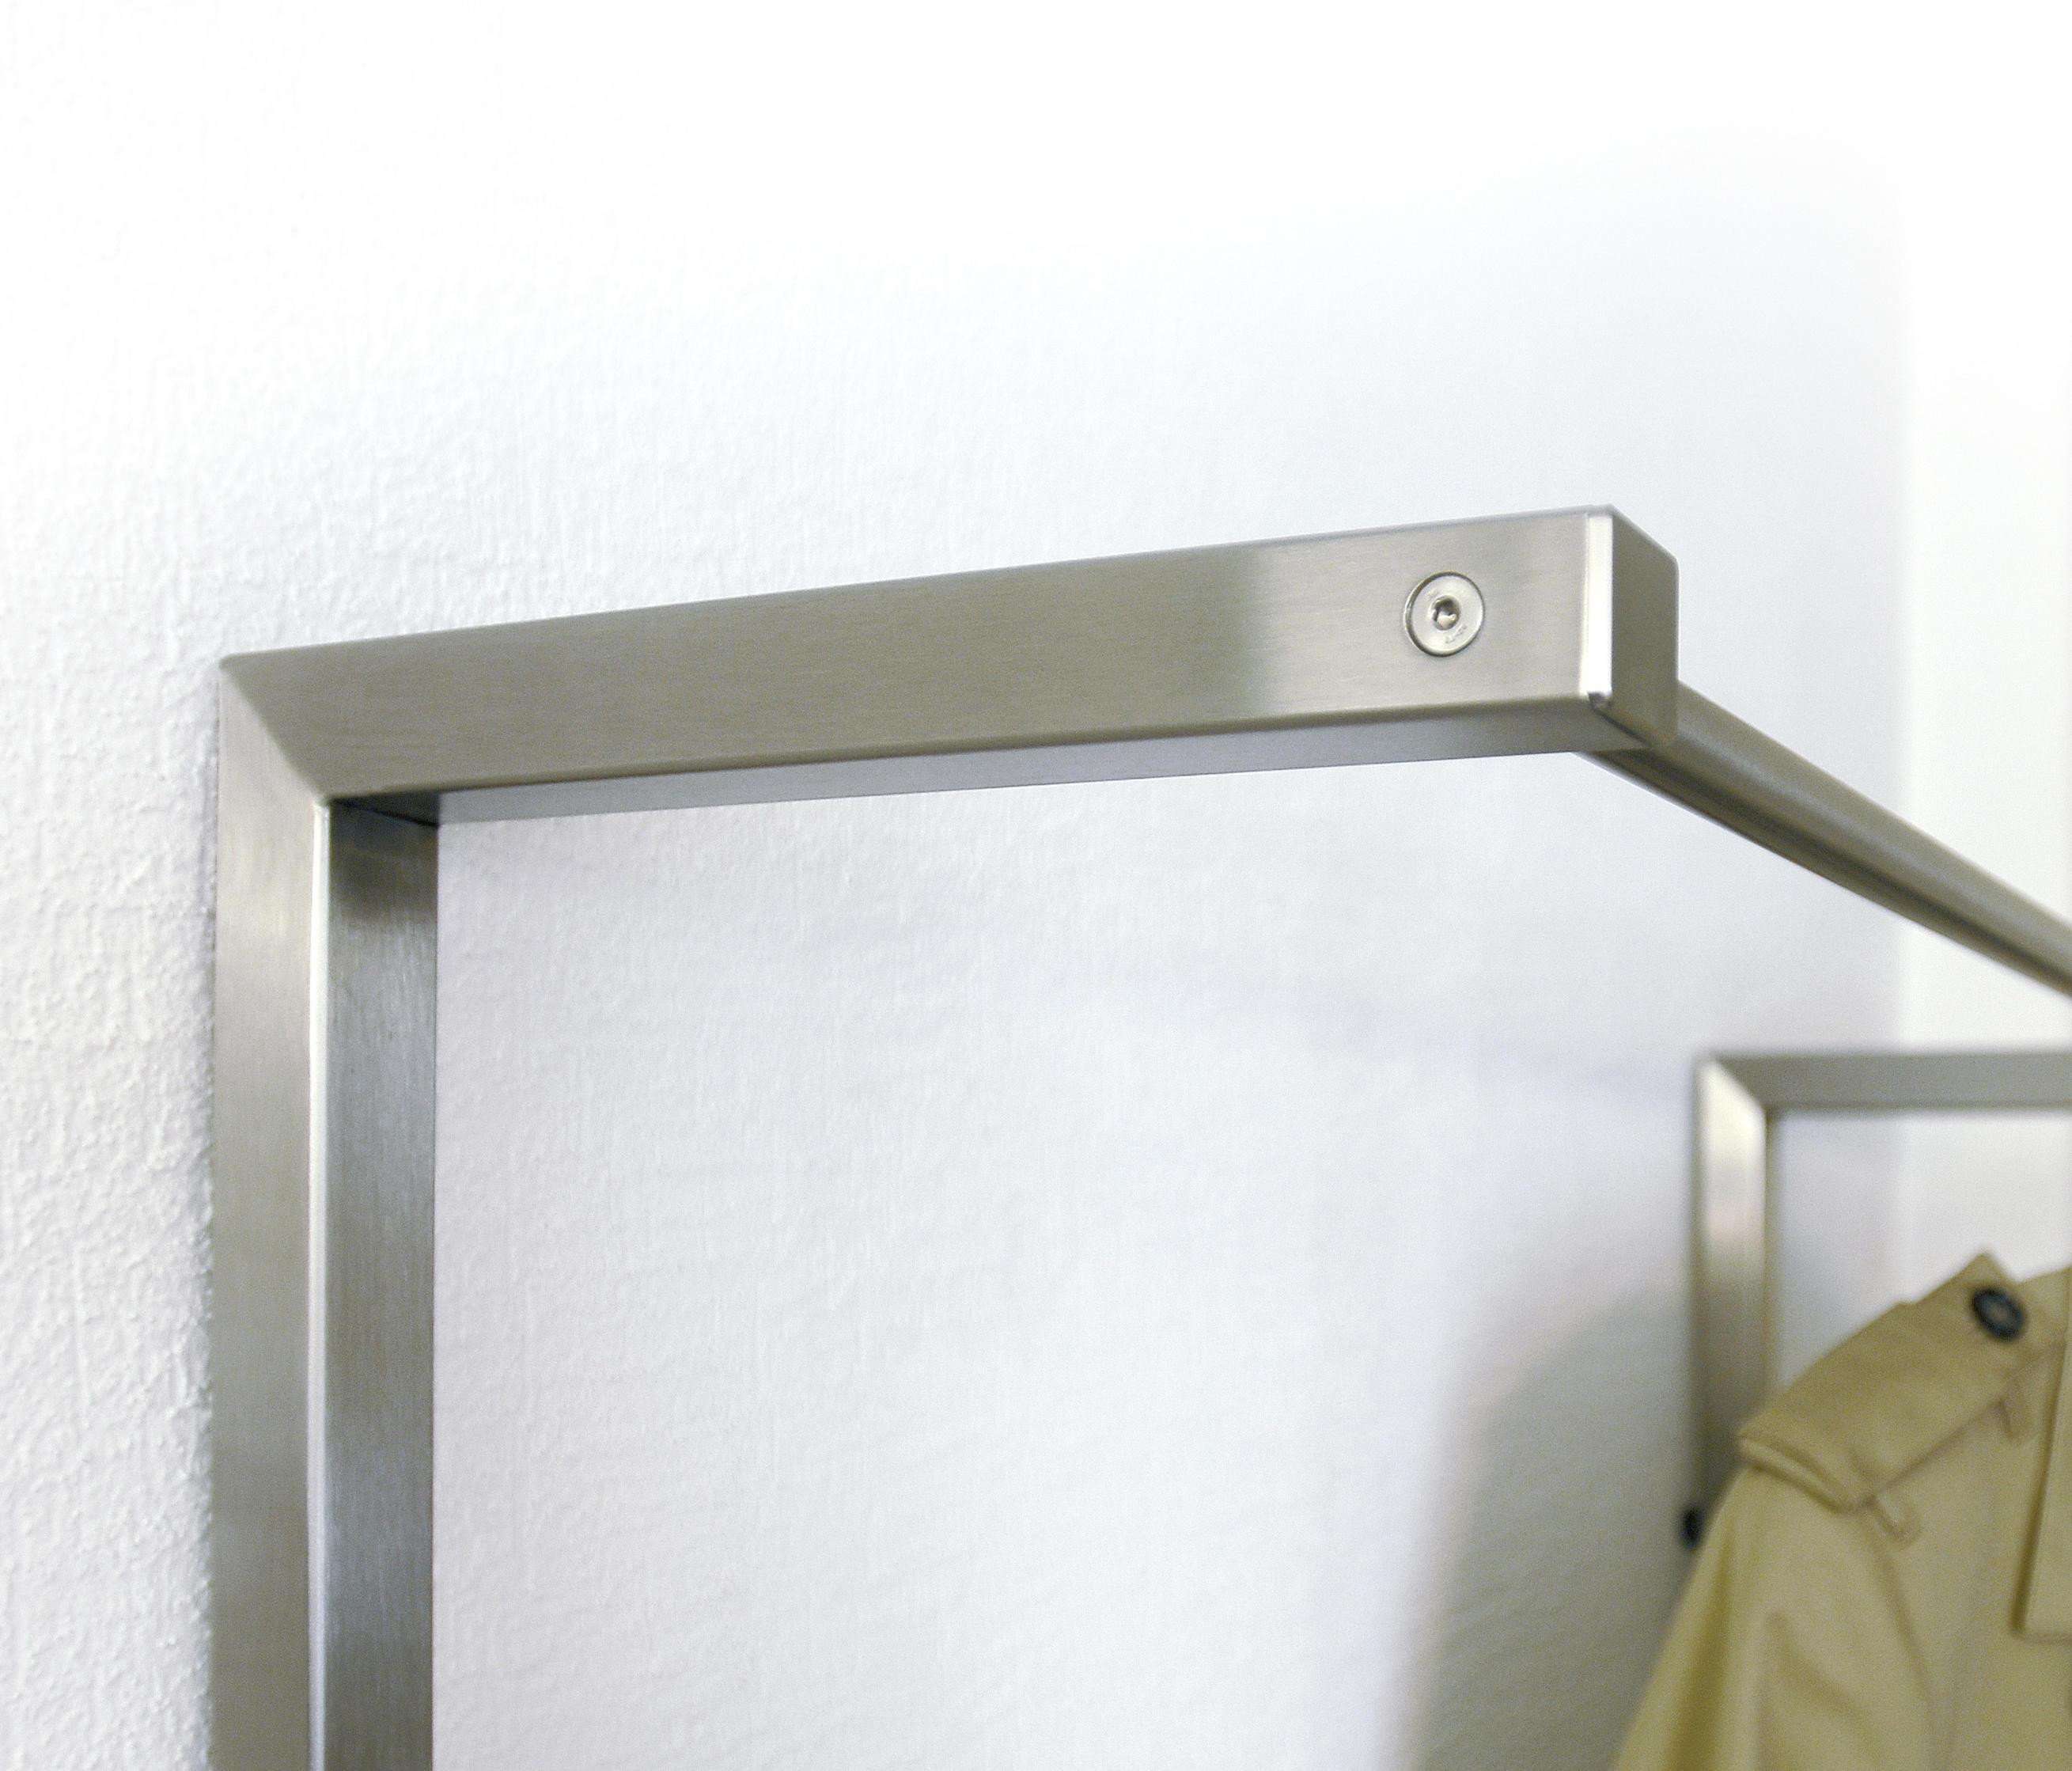 Garderobe n01 built in wardrobes from neustahl architonic for Garderobe exterior